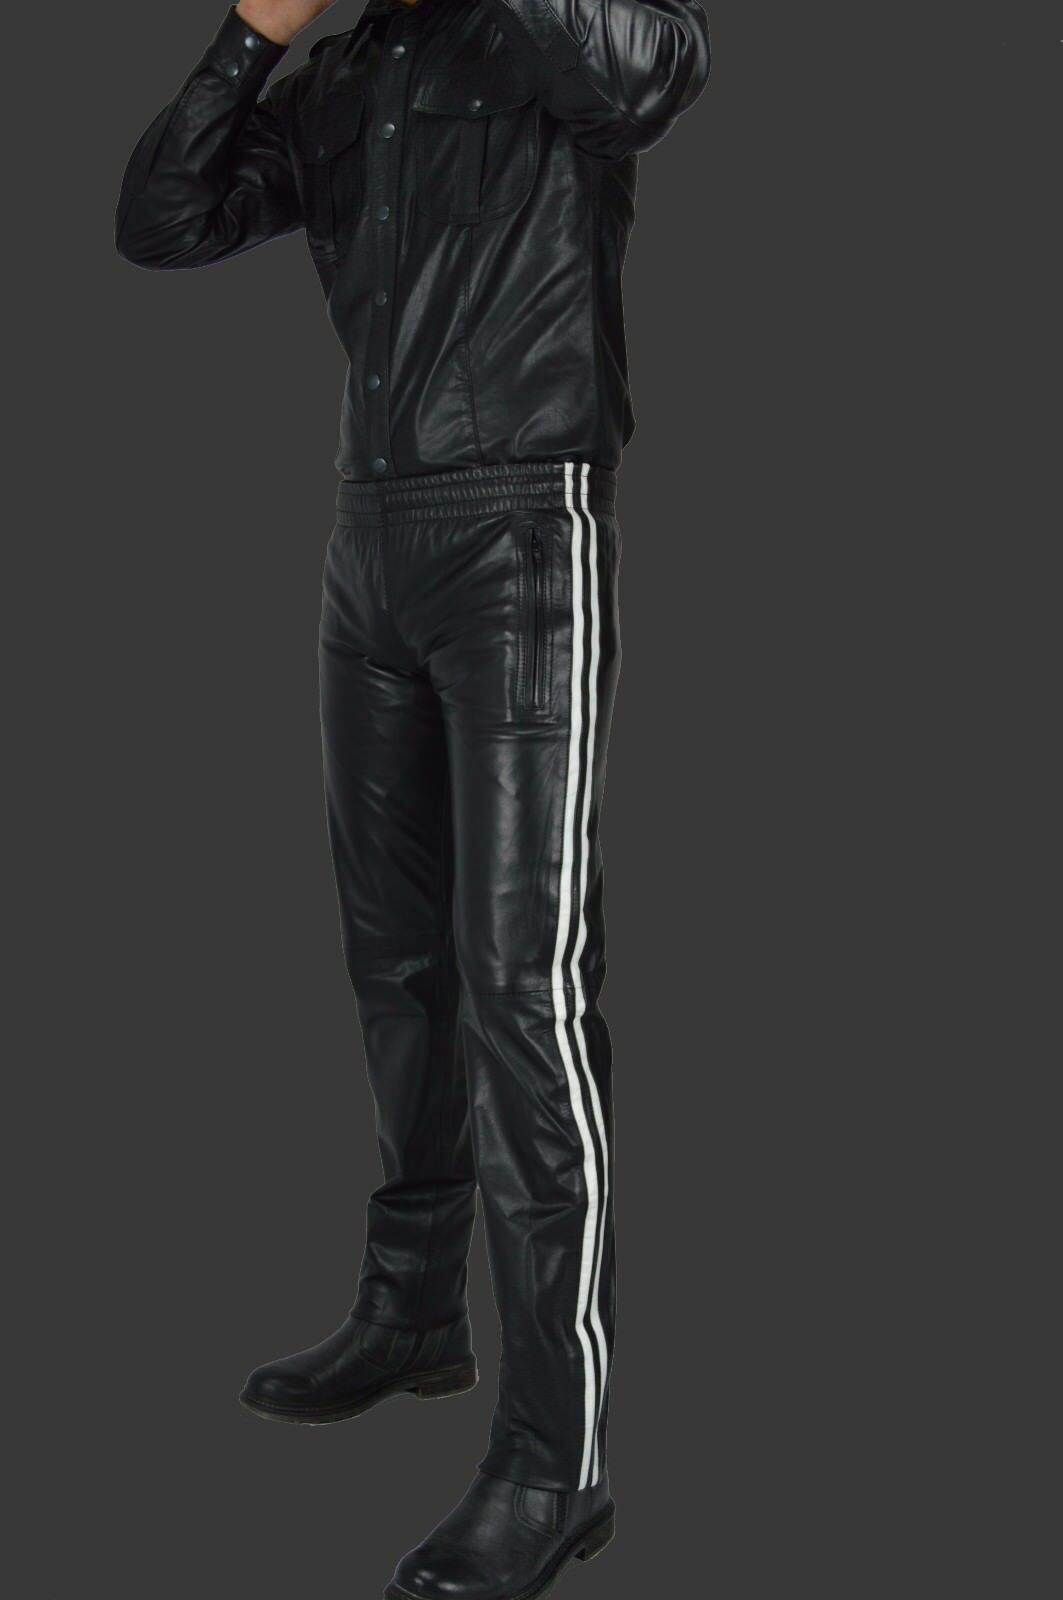 AW-739 AW-739 AW-739 Neue Trainingshose Napa Lederhose Hochwertige Leder Jogginghose Sporthose 211f00